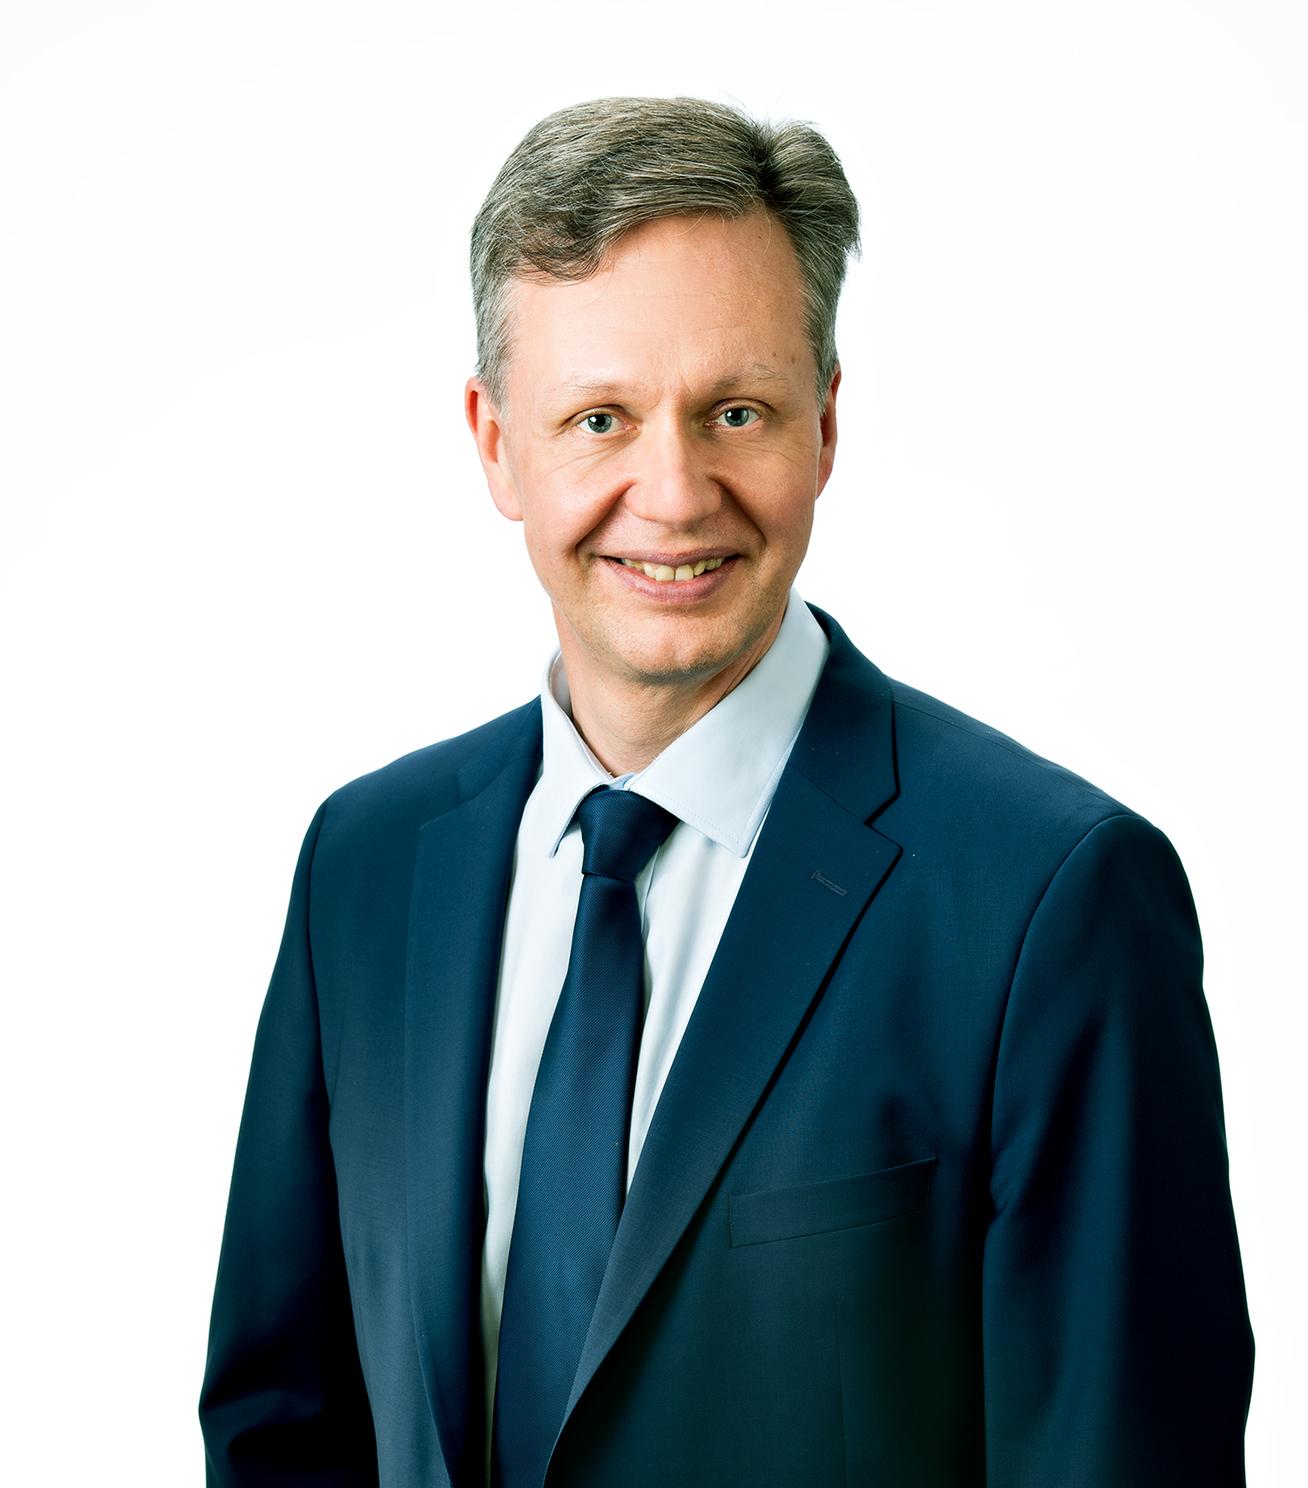 Petri Liuha